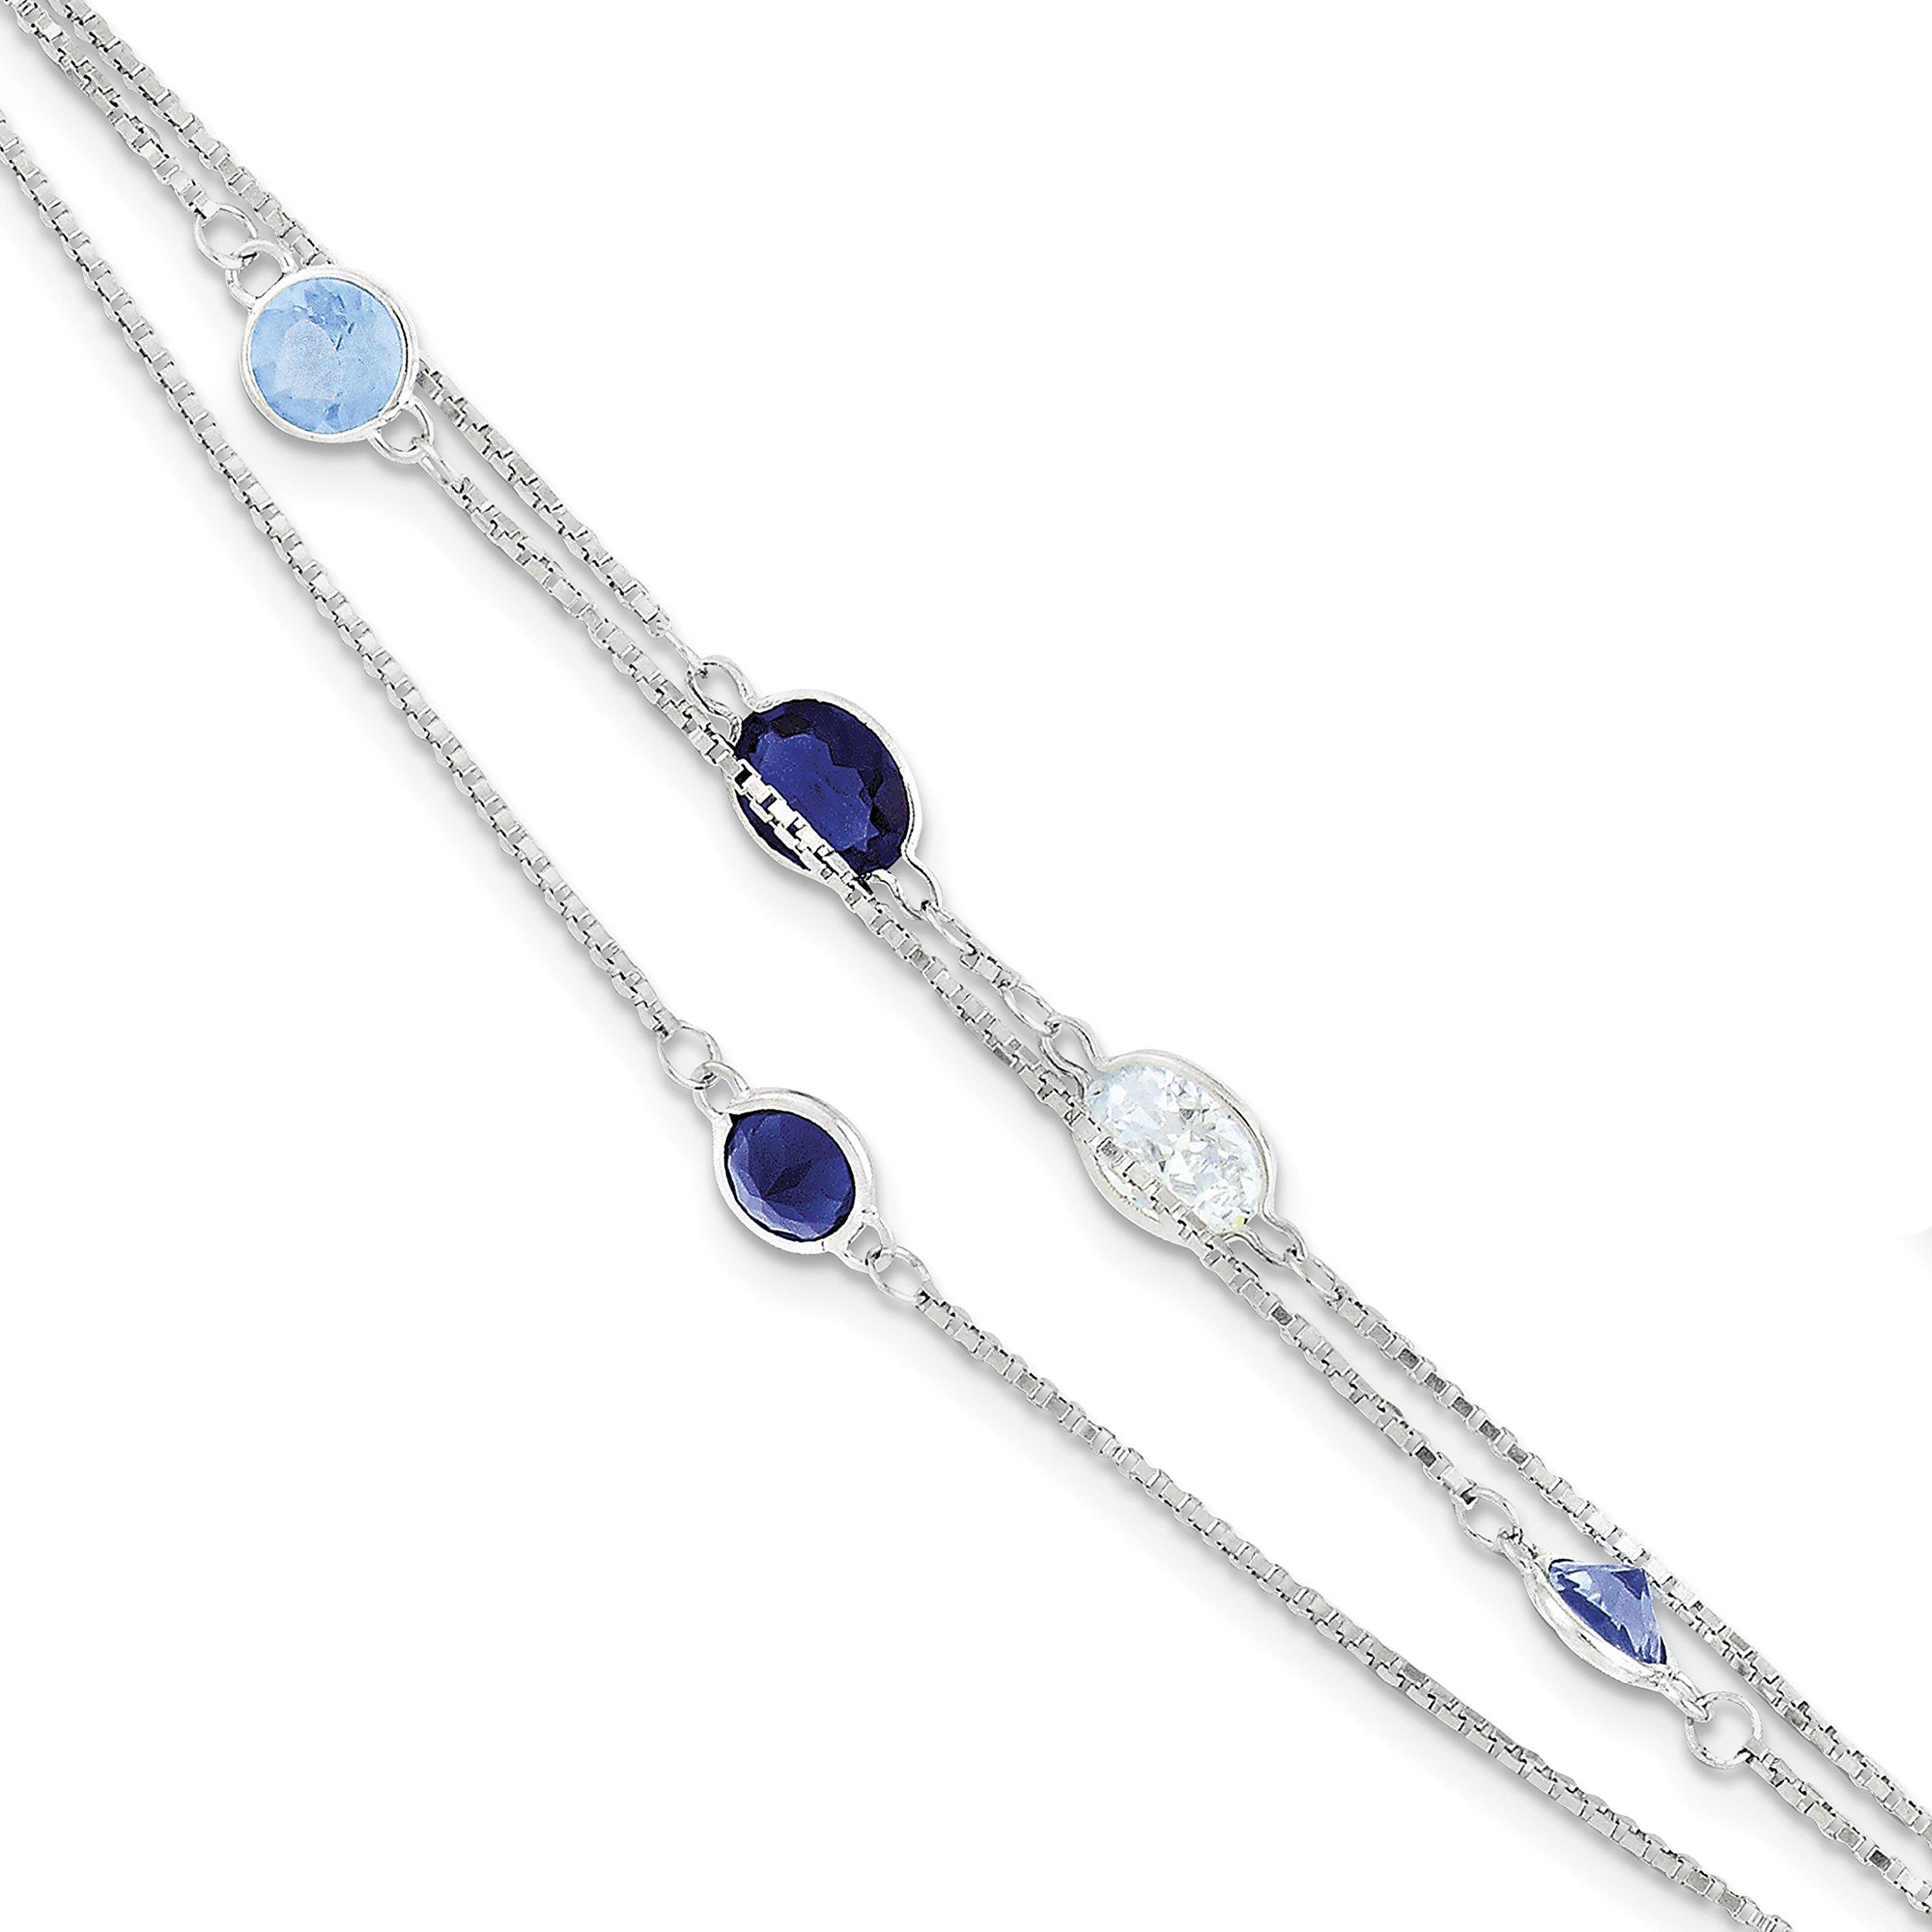 ICE CARATS 925 Sterling Silver Antique Multi Strand Blue/clear Cubic Zirconia Cz Bracelet 7 Inch Chain Multi-str Fancy Fine Jewelry Gift Set For Women Heart